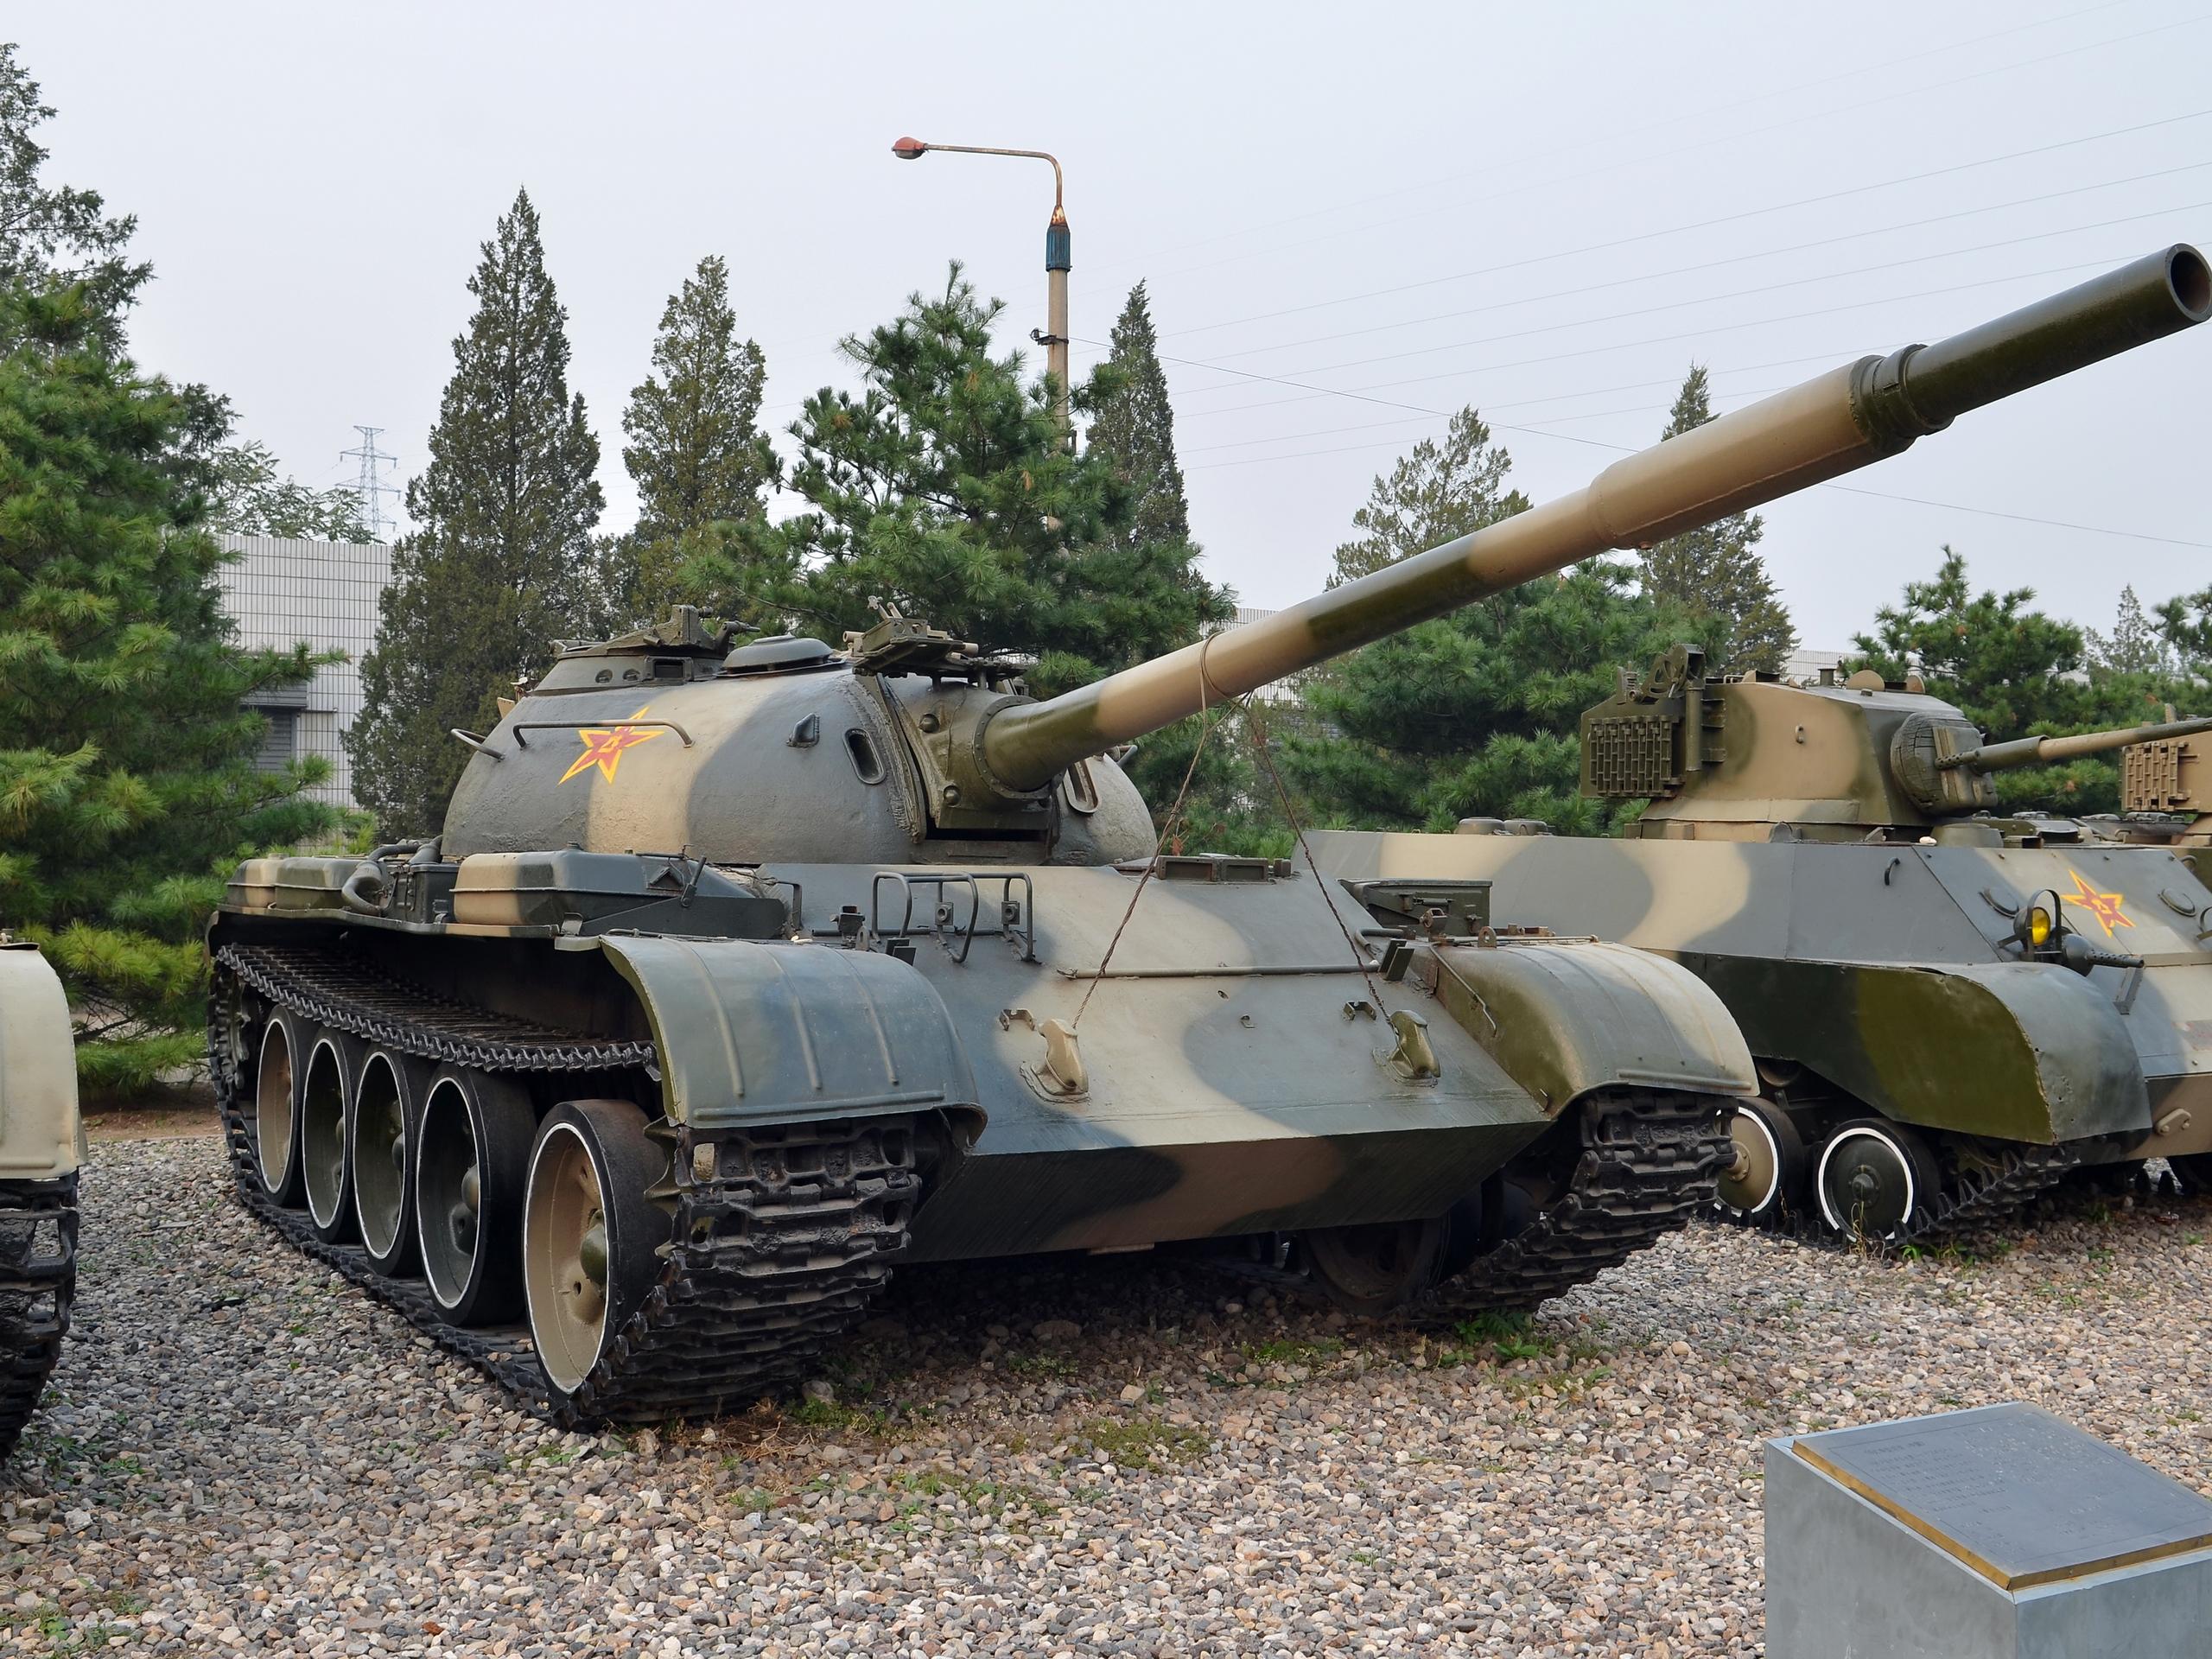 Type_69_at_Tank_Museum_20131004.JPG